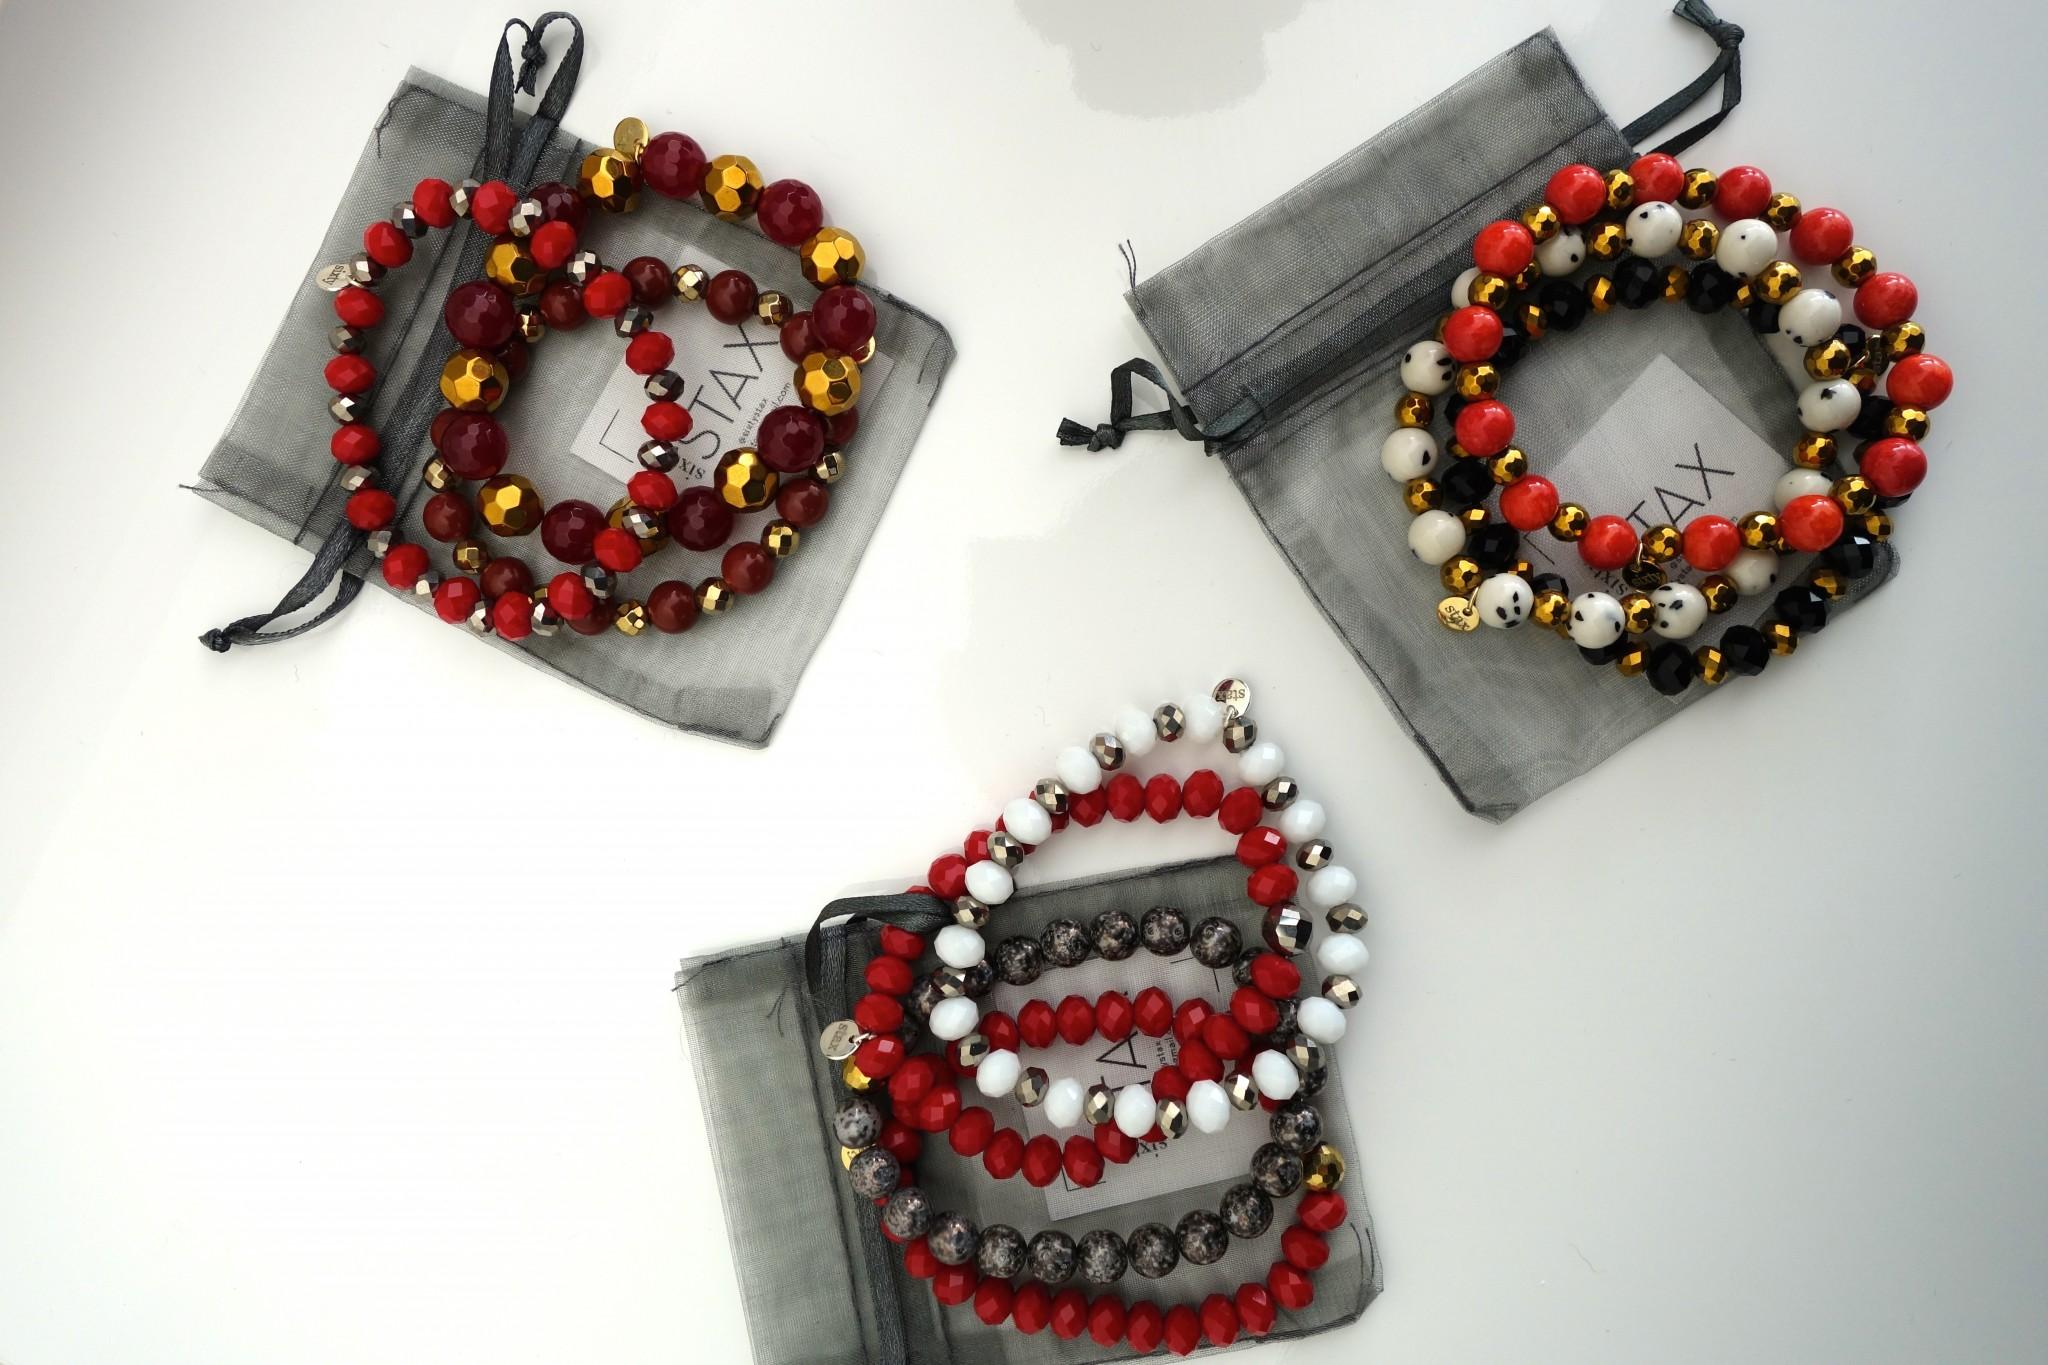 alba boutique, wellesley, the-alyst.com